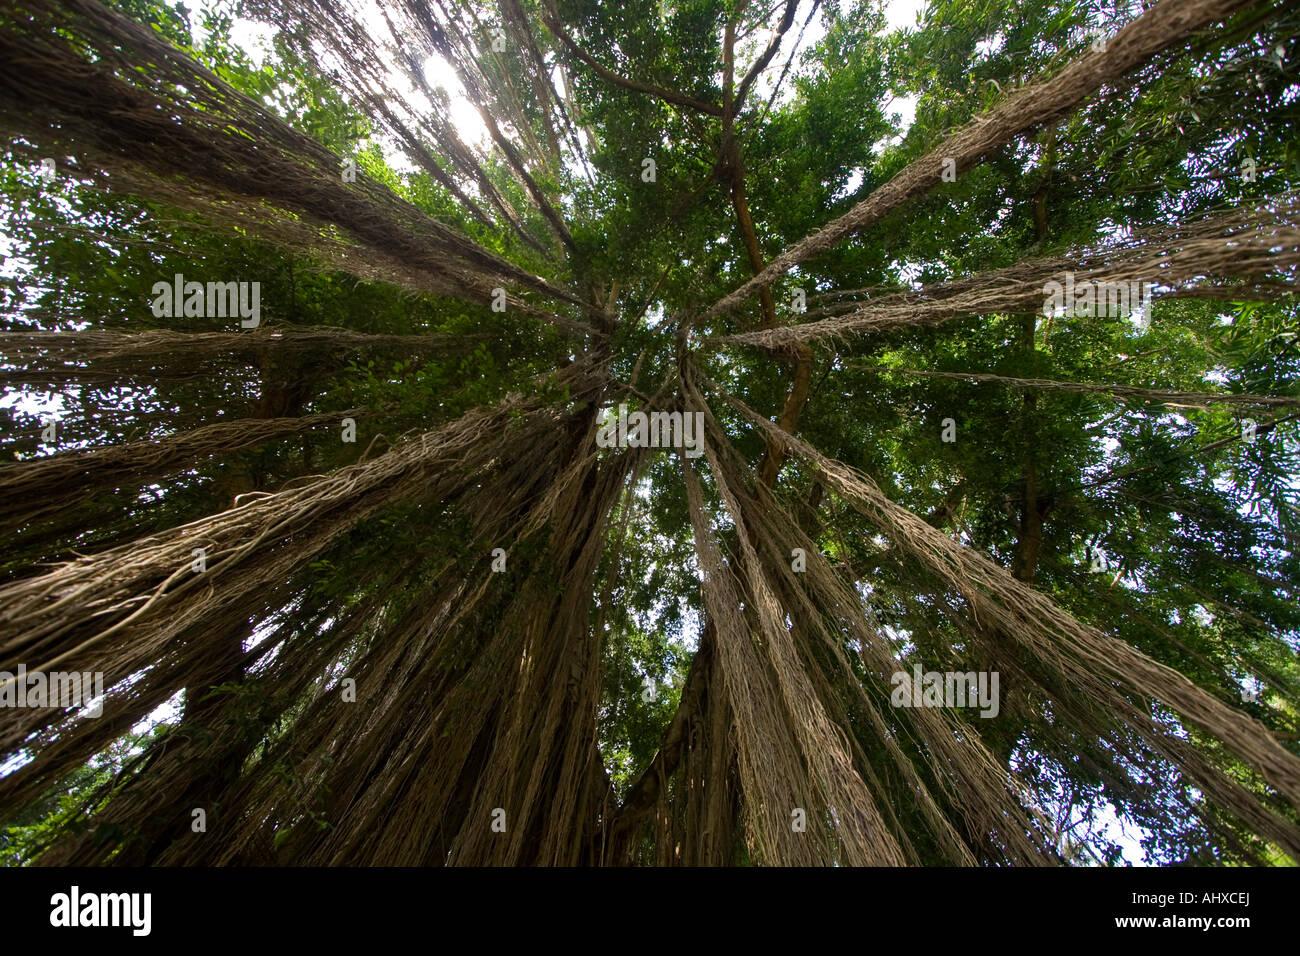 Sun Shining through Hanging Vine Tree Ayung River Gorge Ubud Bali Indonesia - Stock Image